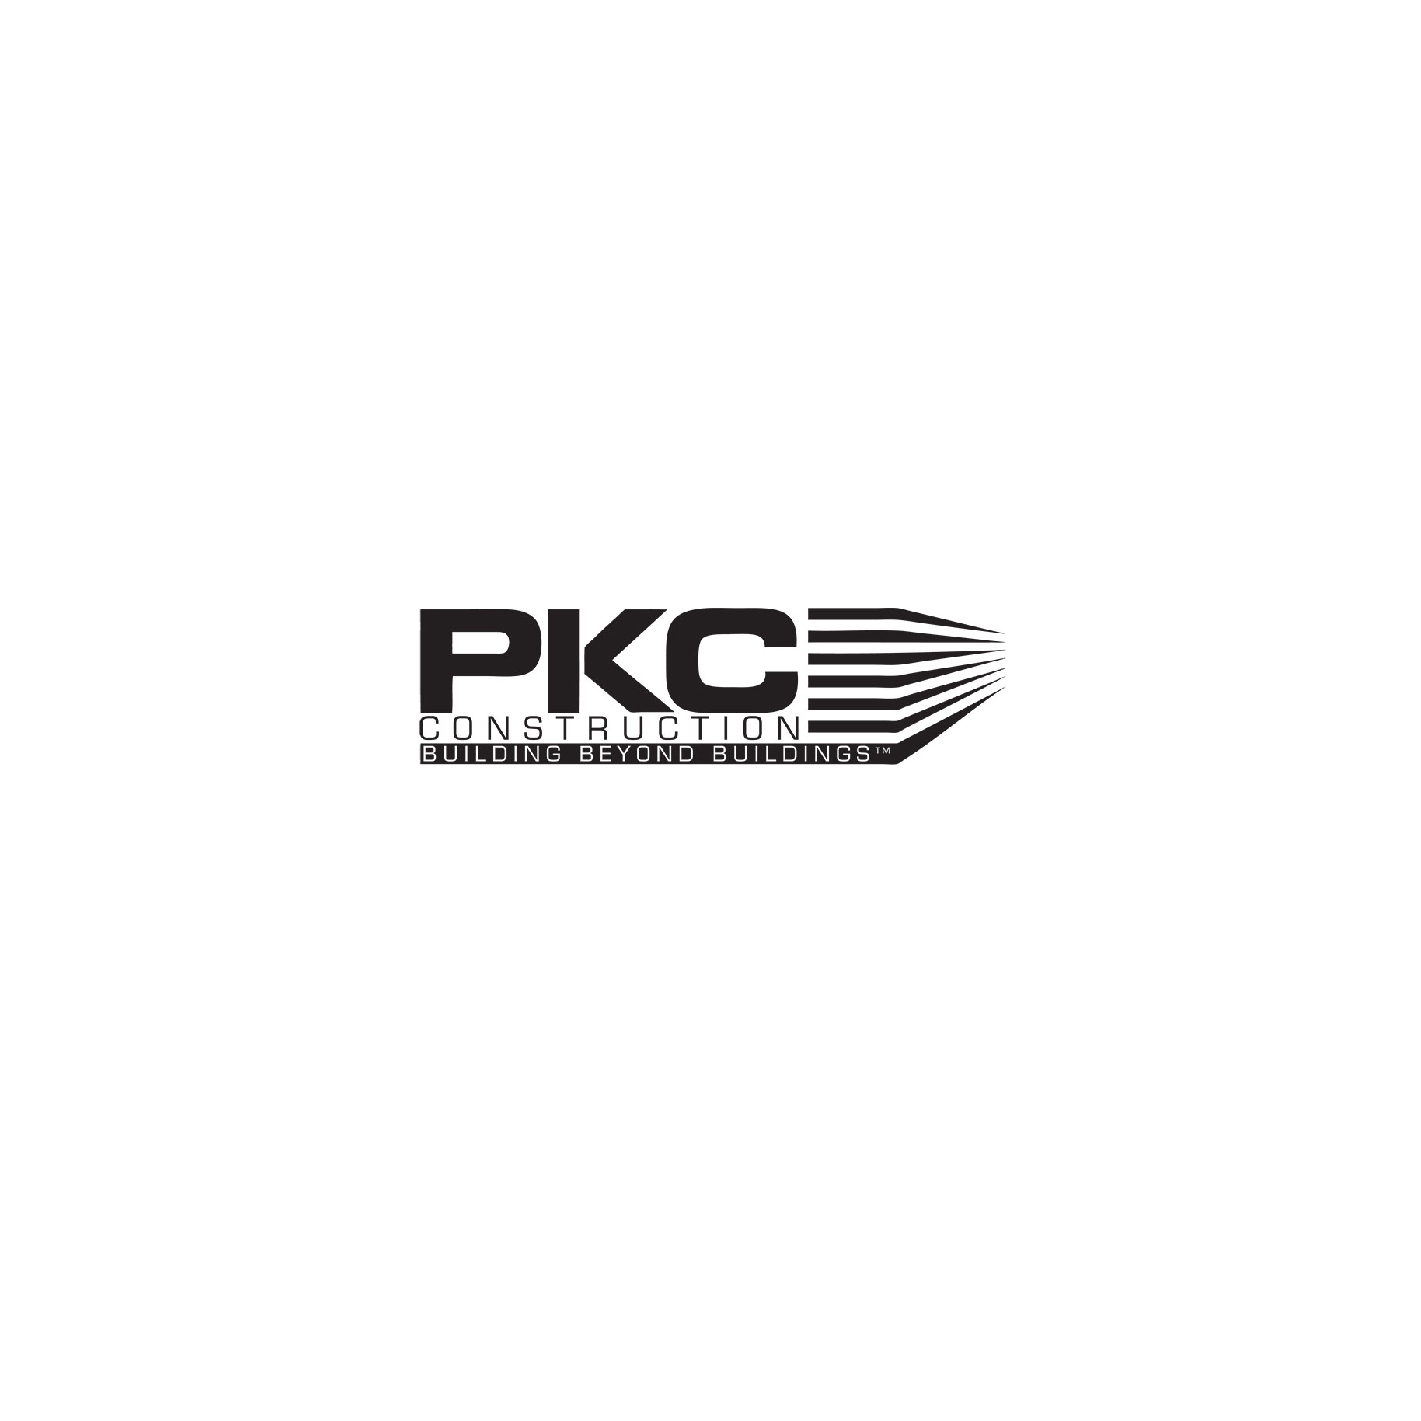 PKC Construction | General Contractor